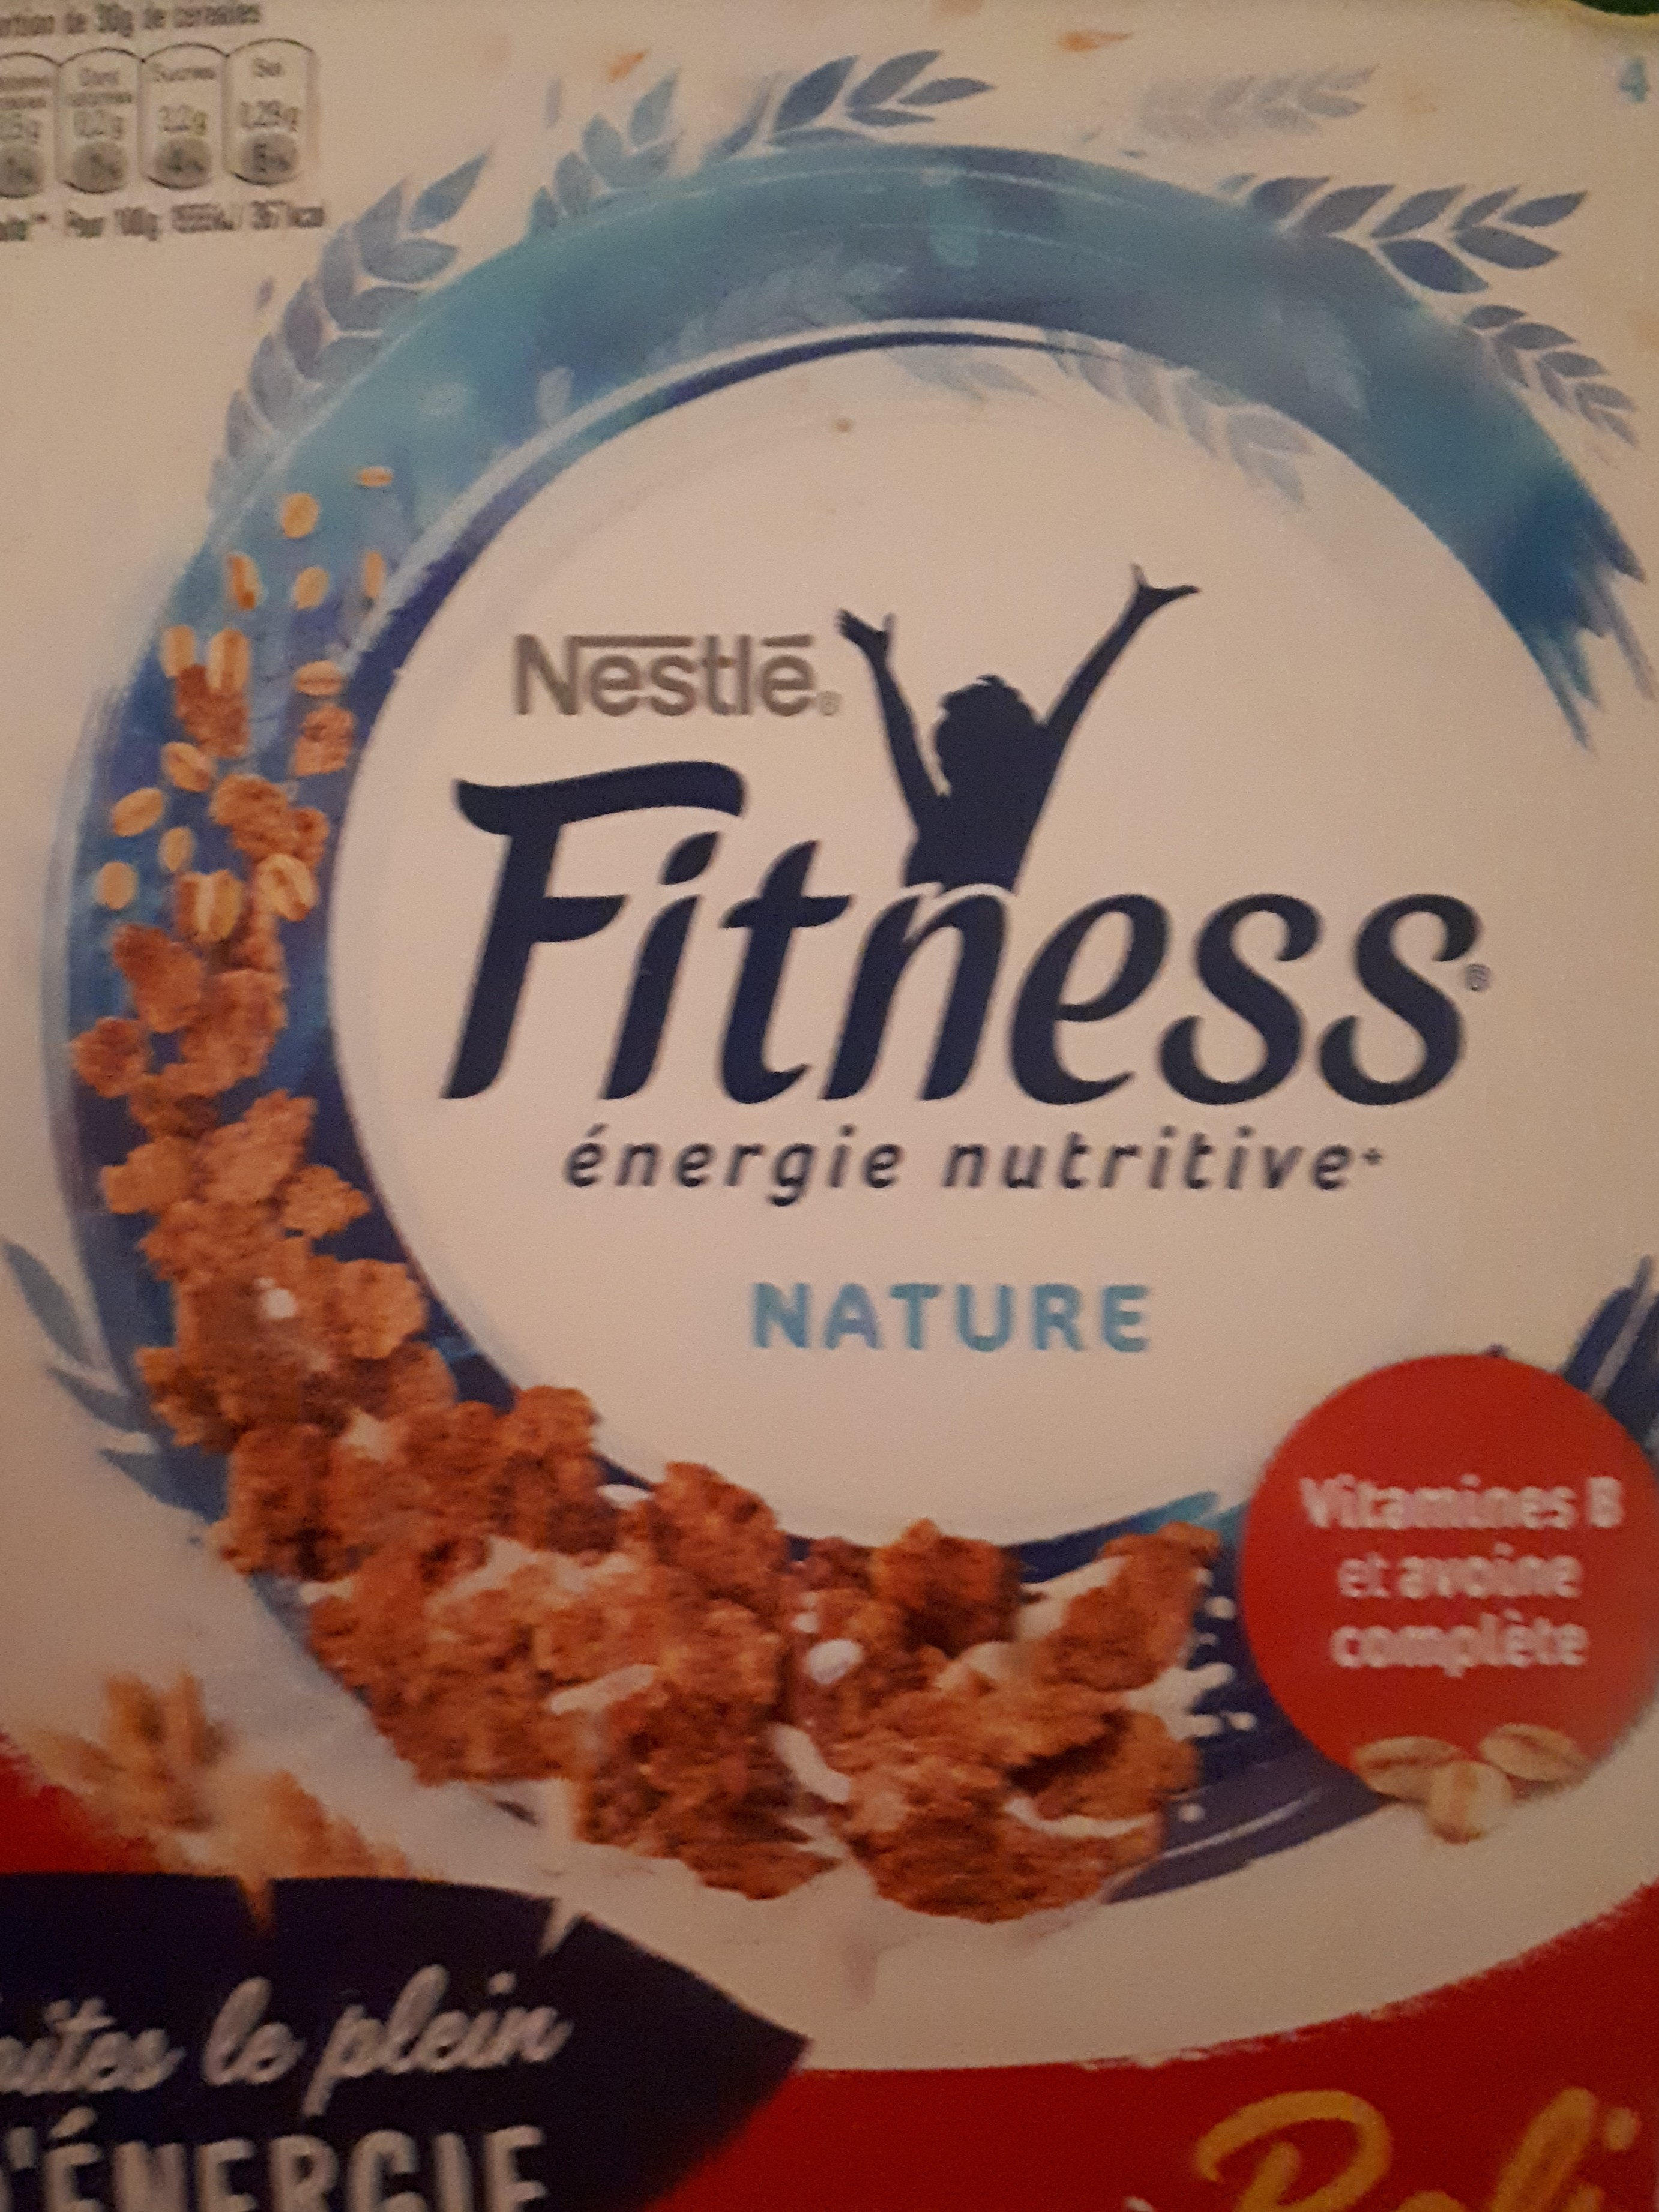 fitness énergie nutritive - Product - fr